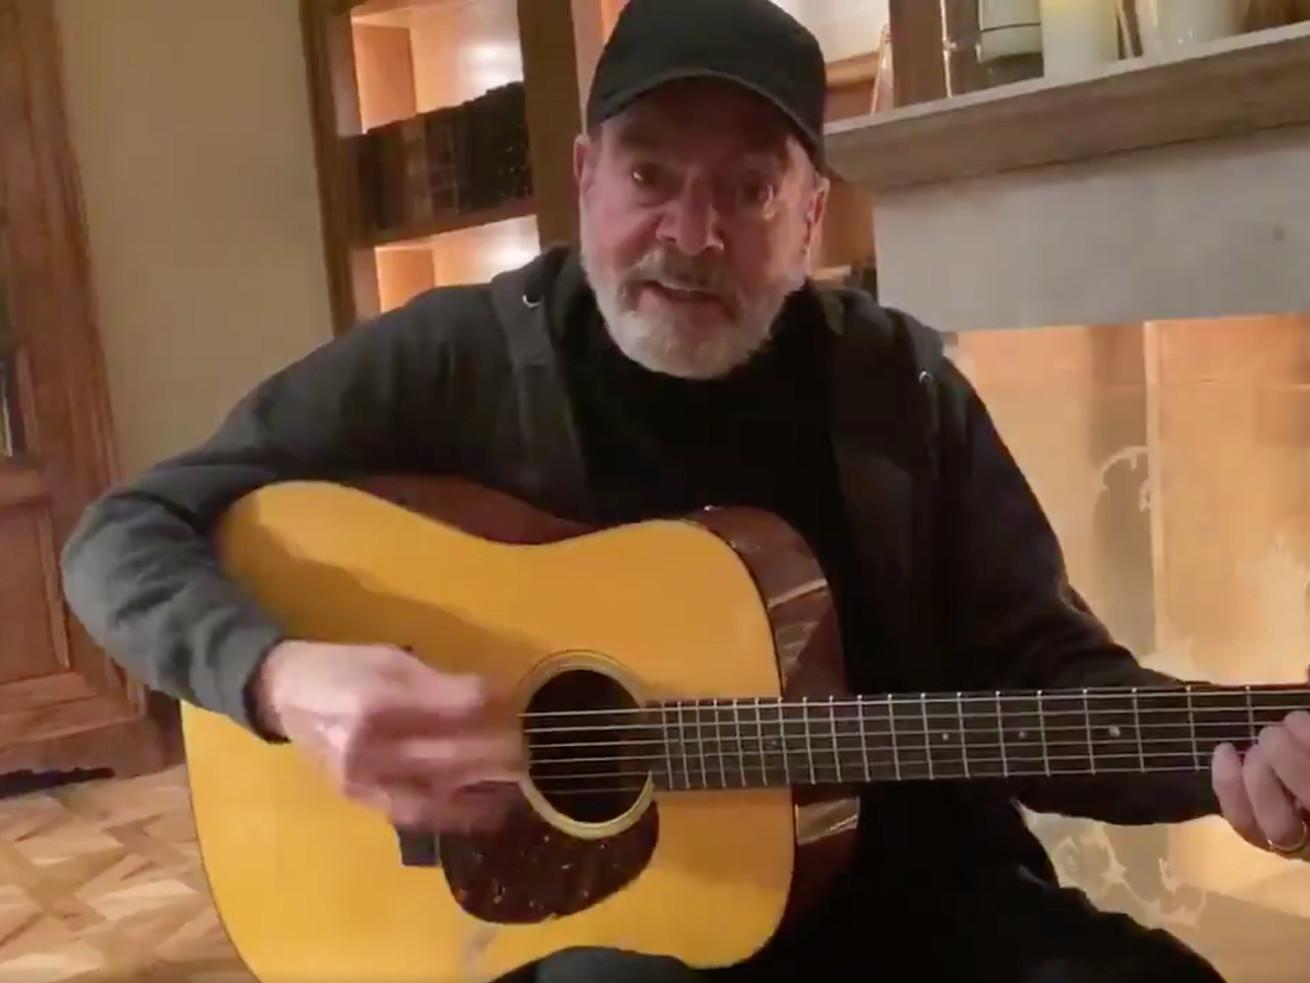 Neil Diamond Updated Sweet Caroline's Lyrics To Remind Us To Wash Our Hands